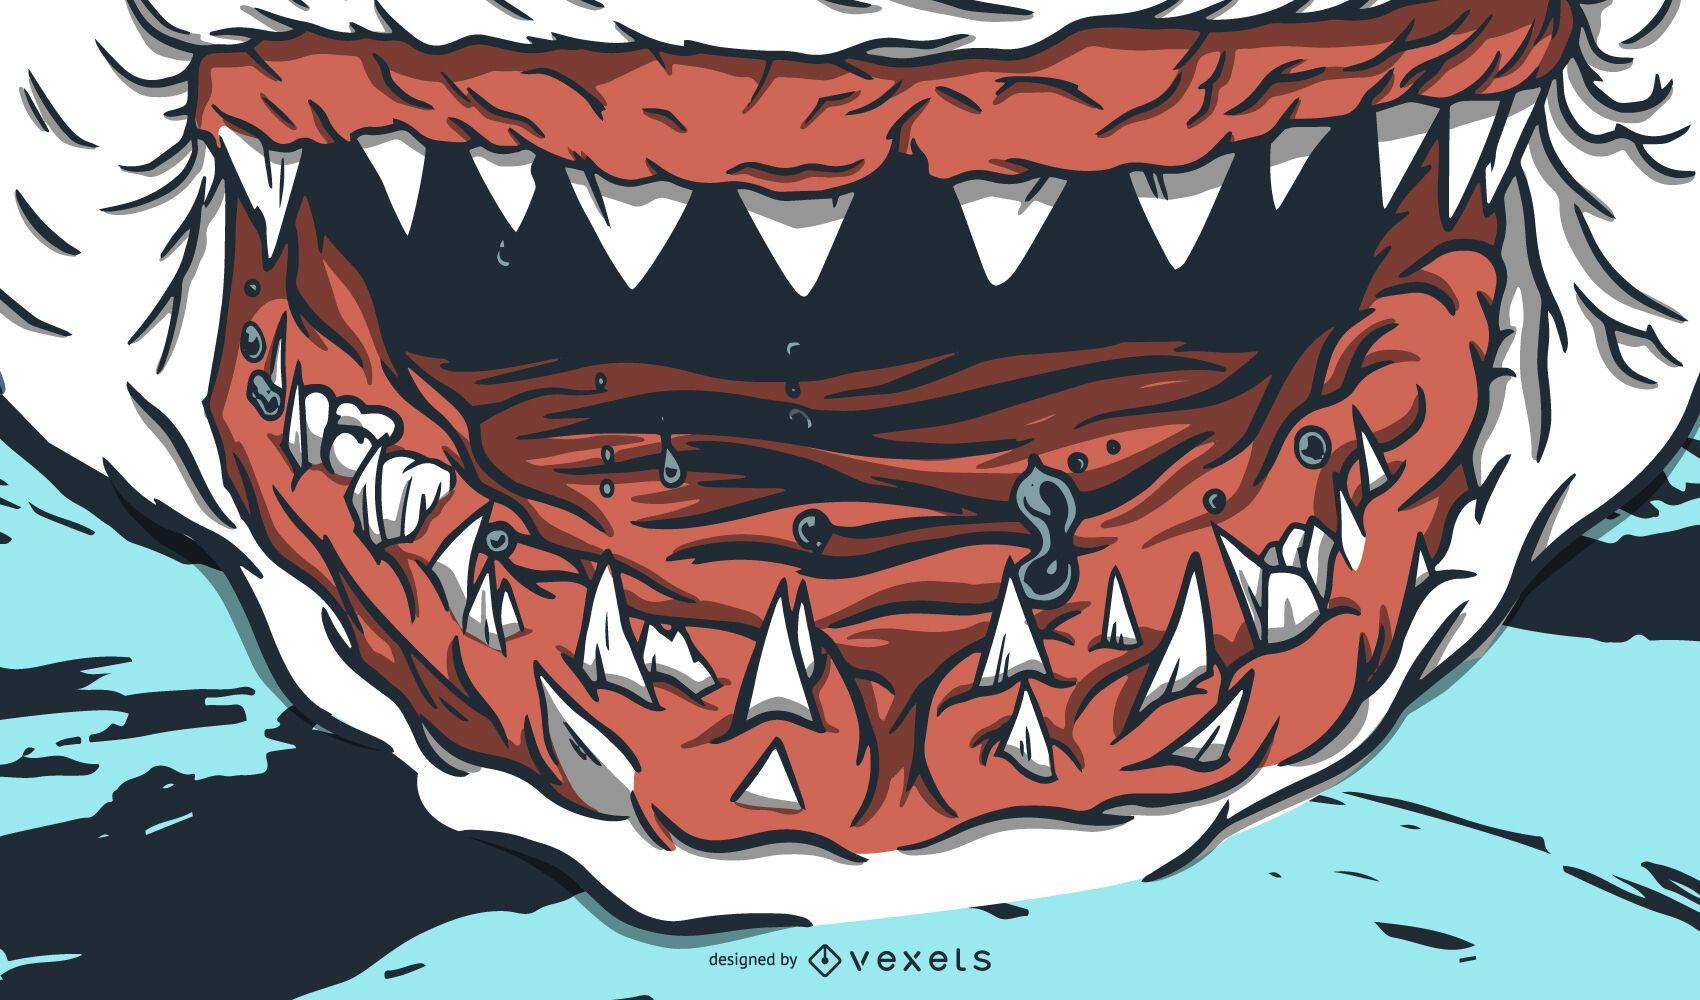 Shark's teeth illustration design